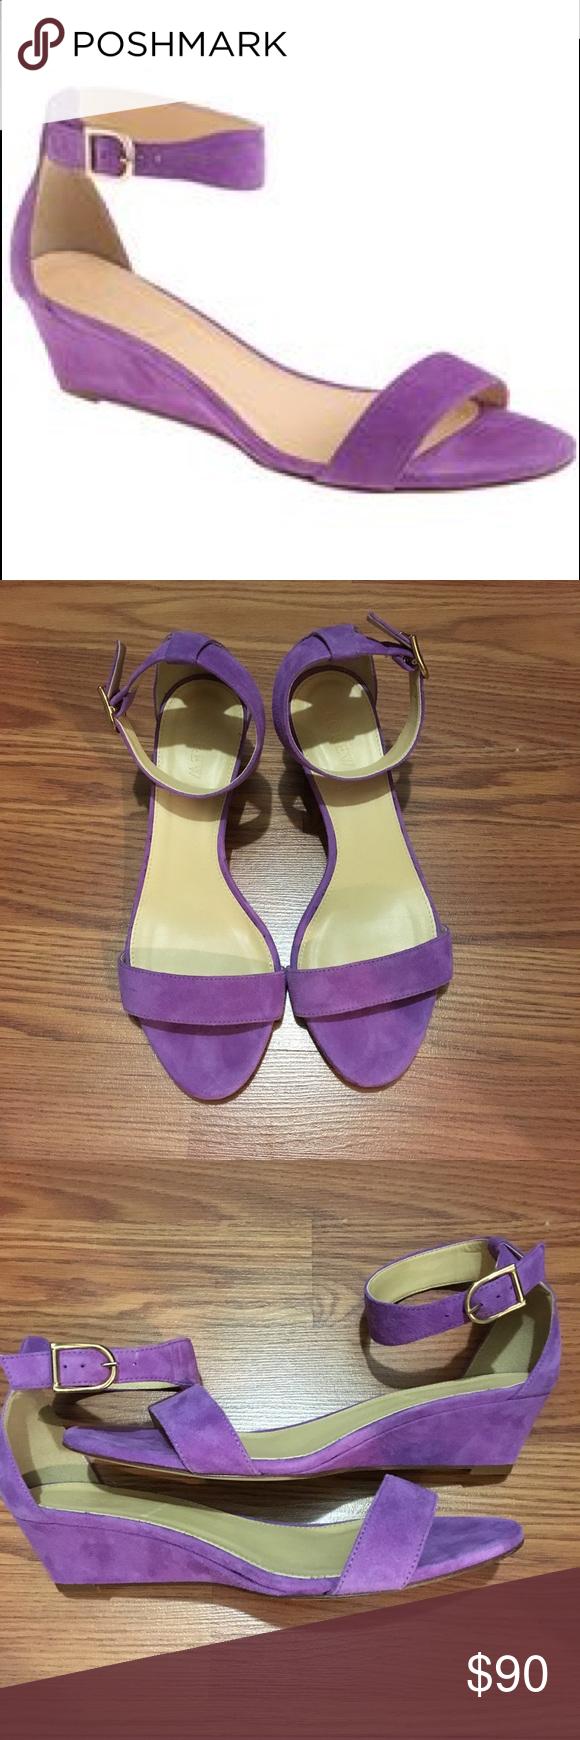 74753871625 J Crew Lillian suede wedge sandals 7.5 1 3 4